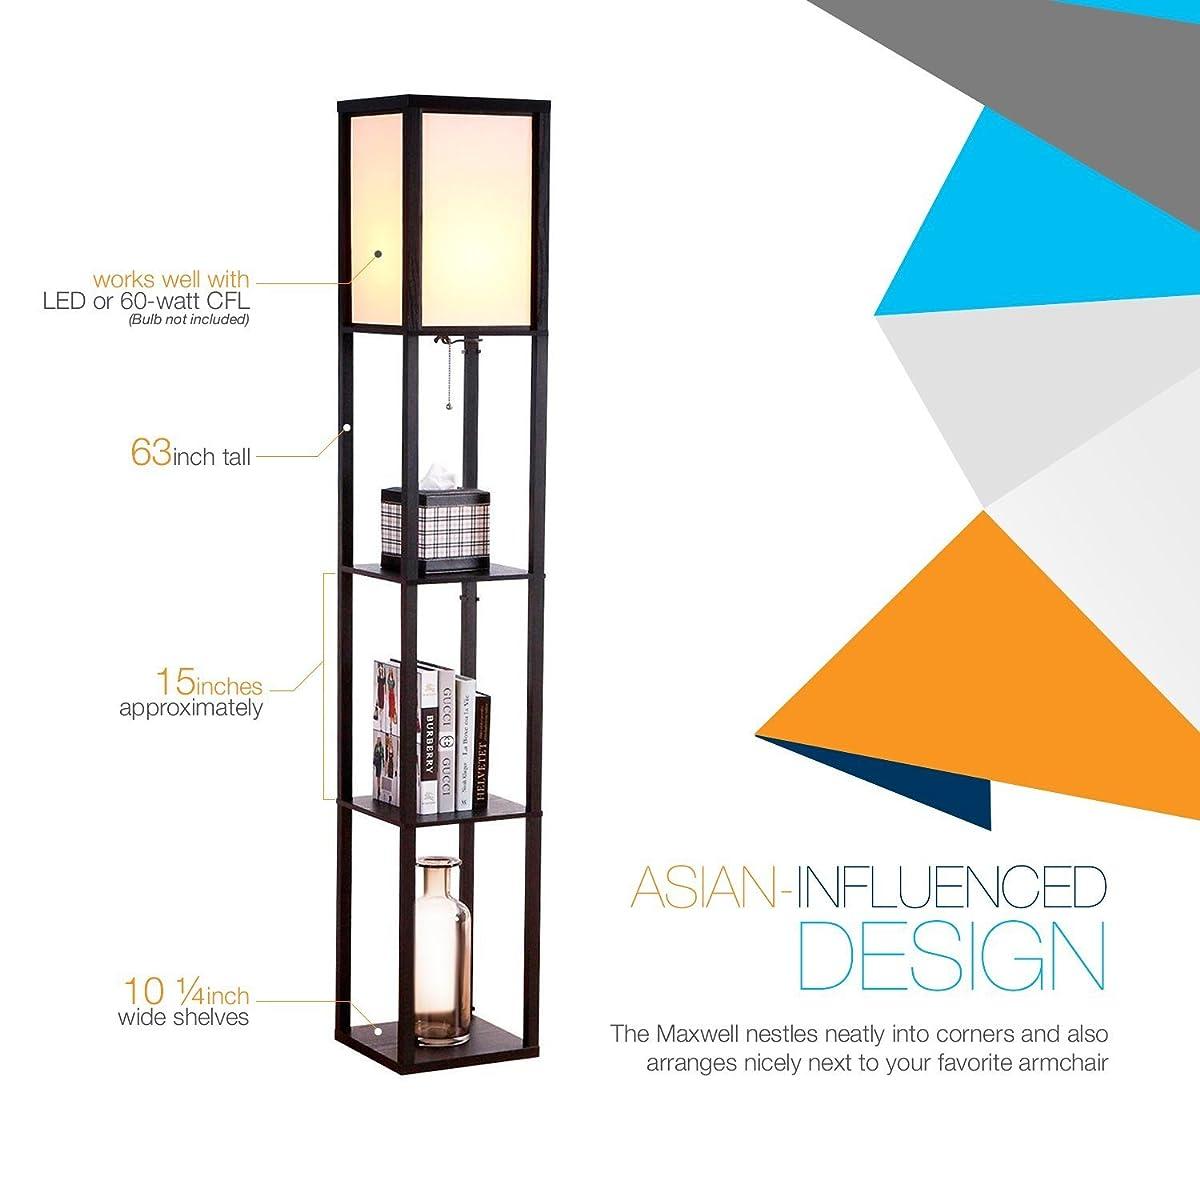 Brightech Maxwell - LED Shelf Floor Lamp - Modern Standing Light for Living Rooms & Bedrooms - Asian Wooden Frame with Open Box Display Shelves - Black